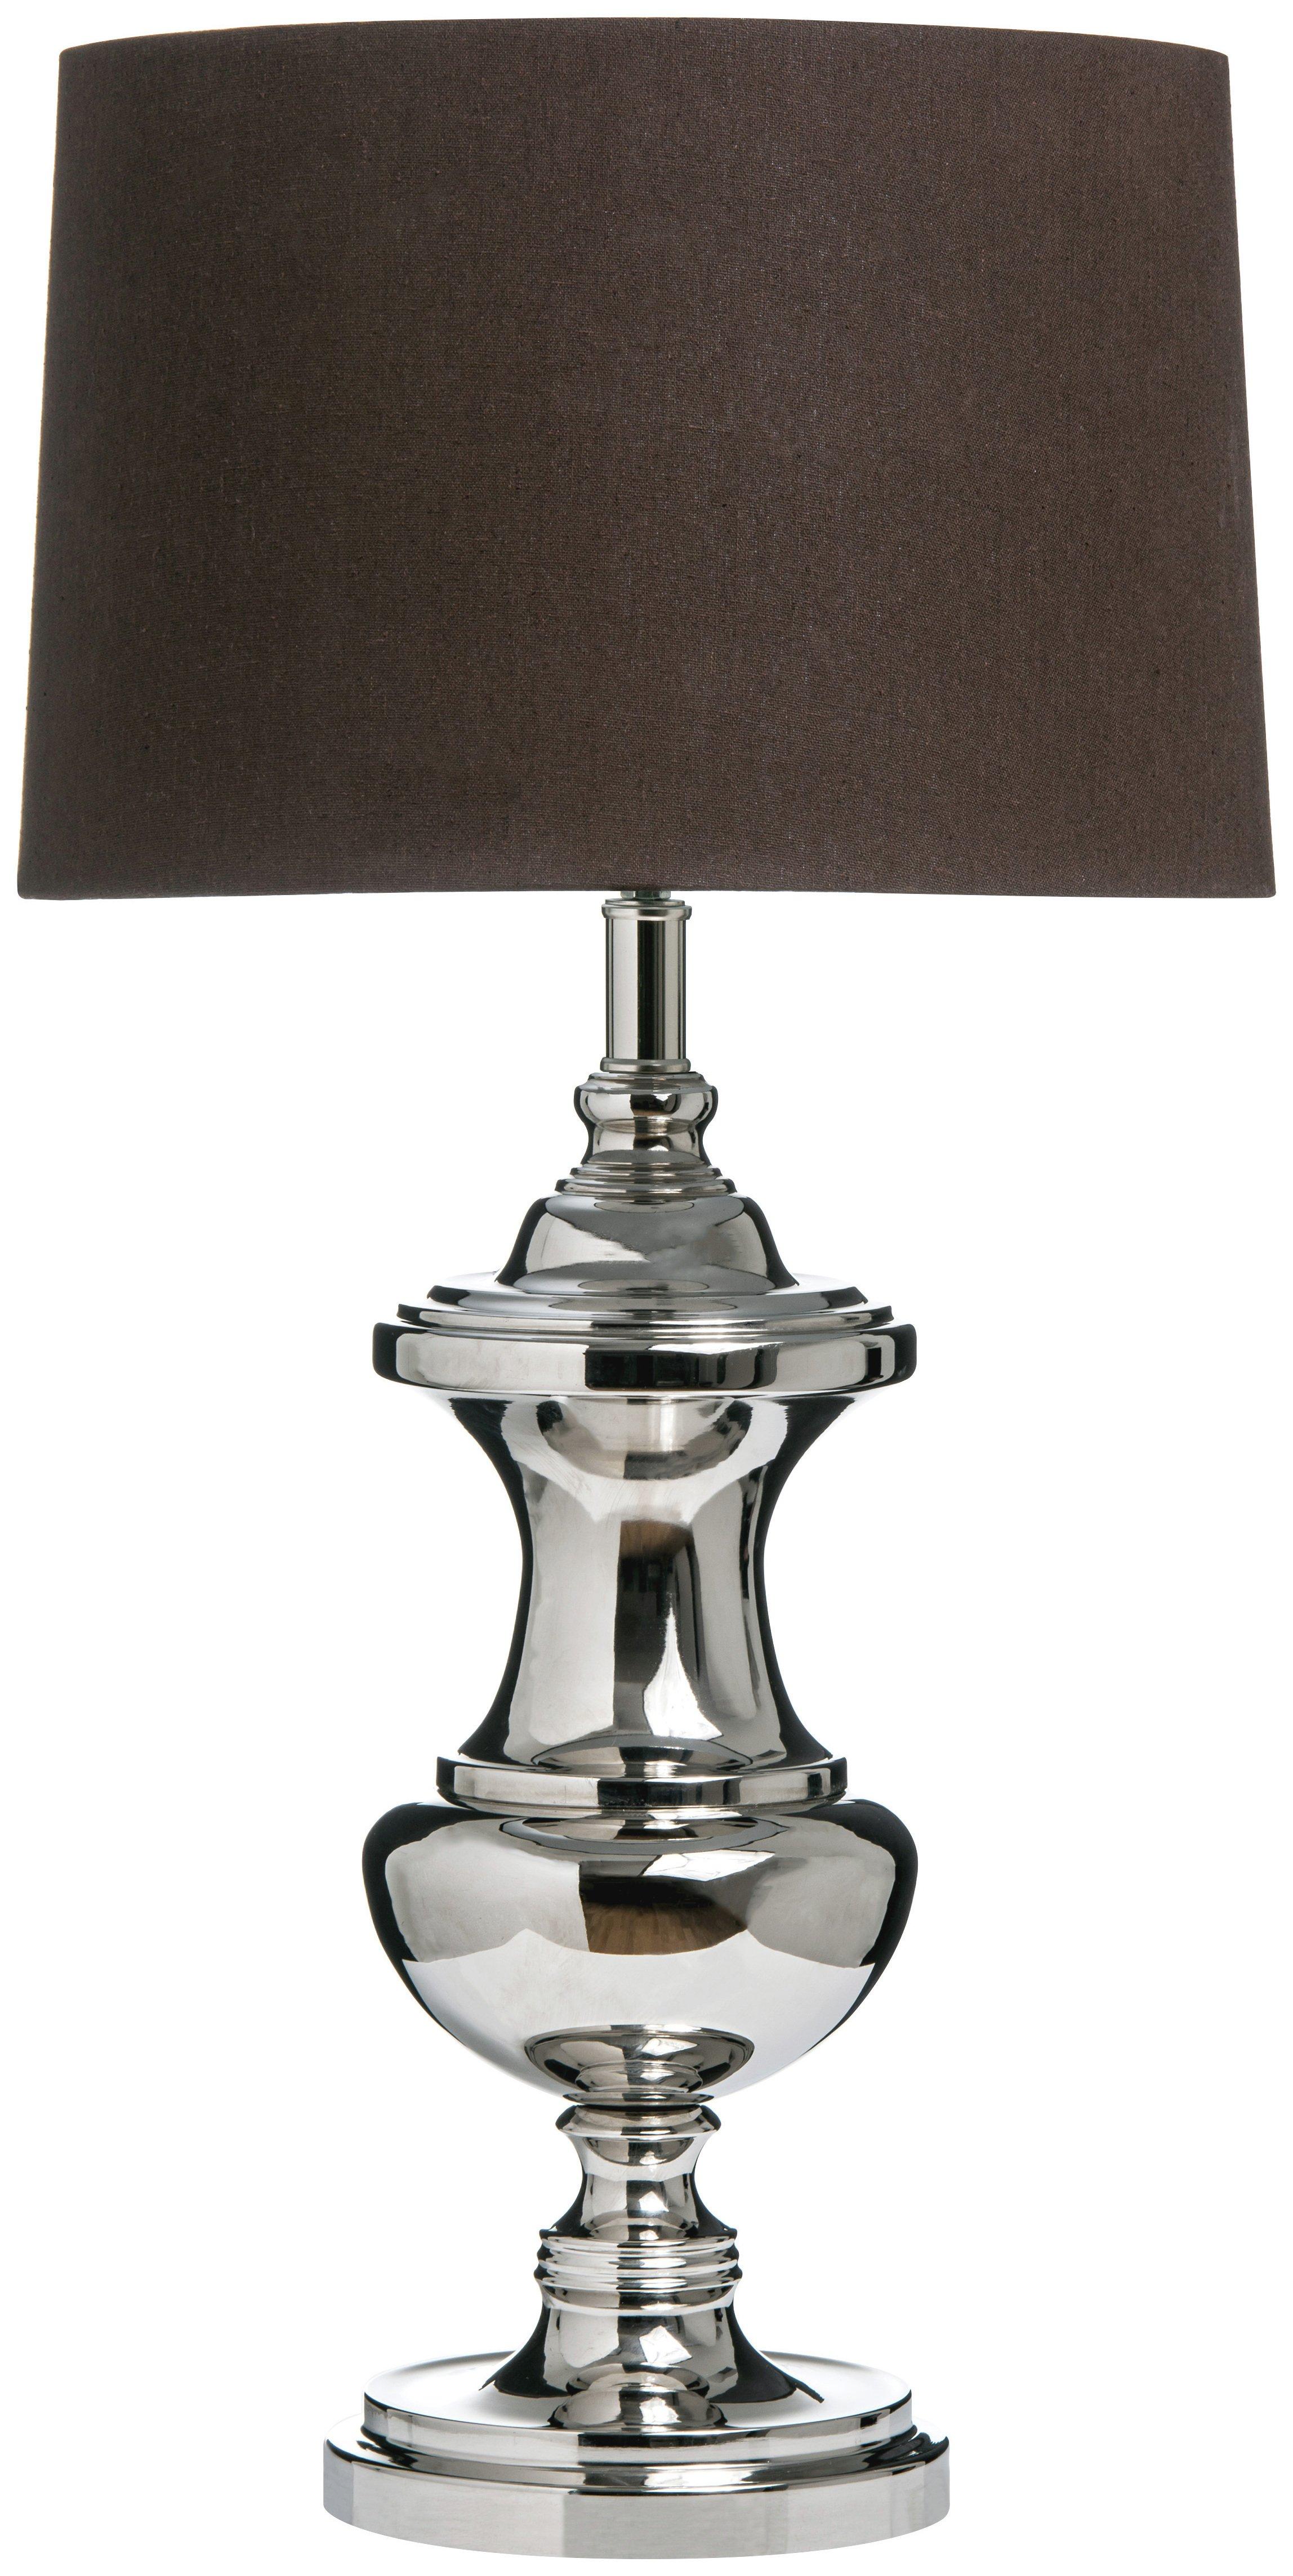 Image of Premier Housewares Ara Table Lamp - Black and Silver.